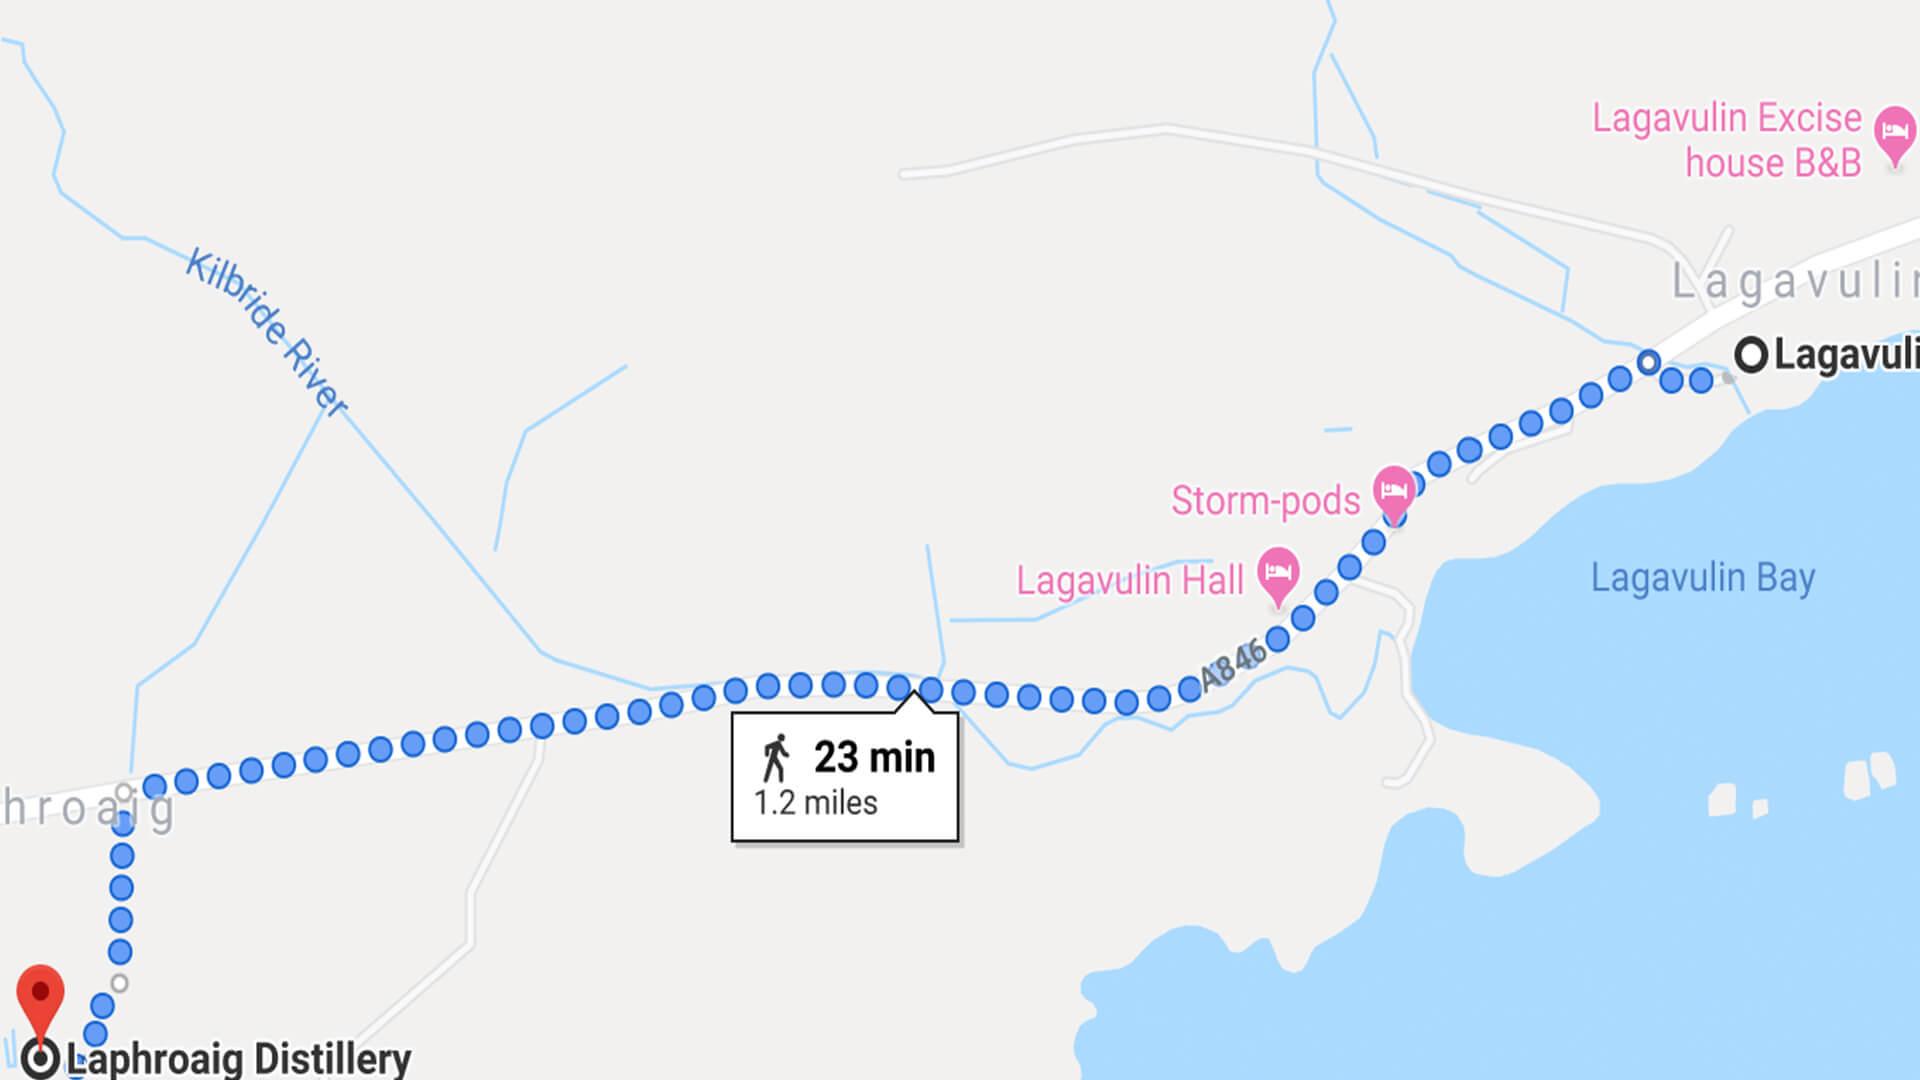 Lagavulin to Laphroaig